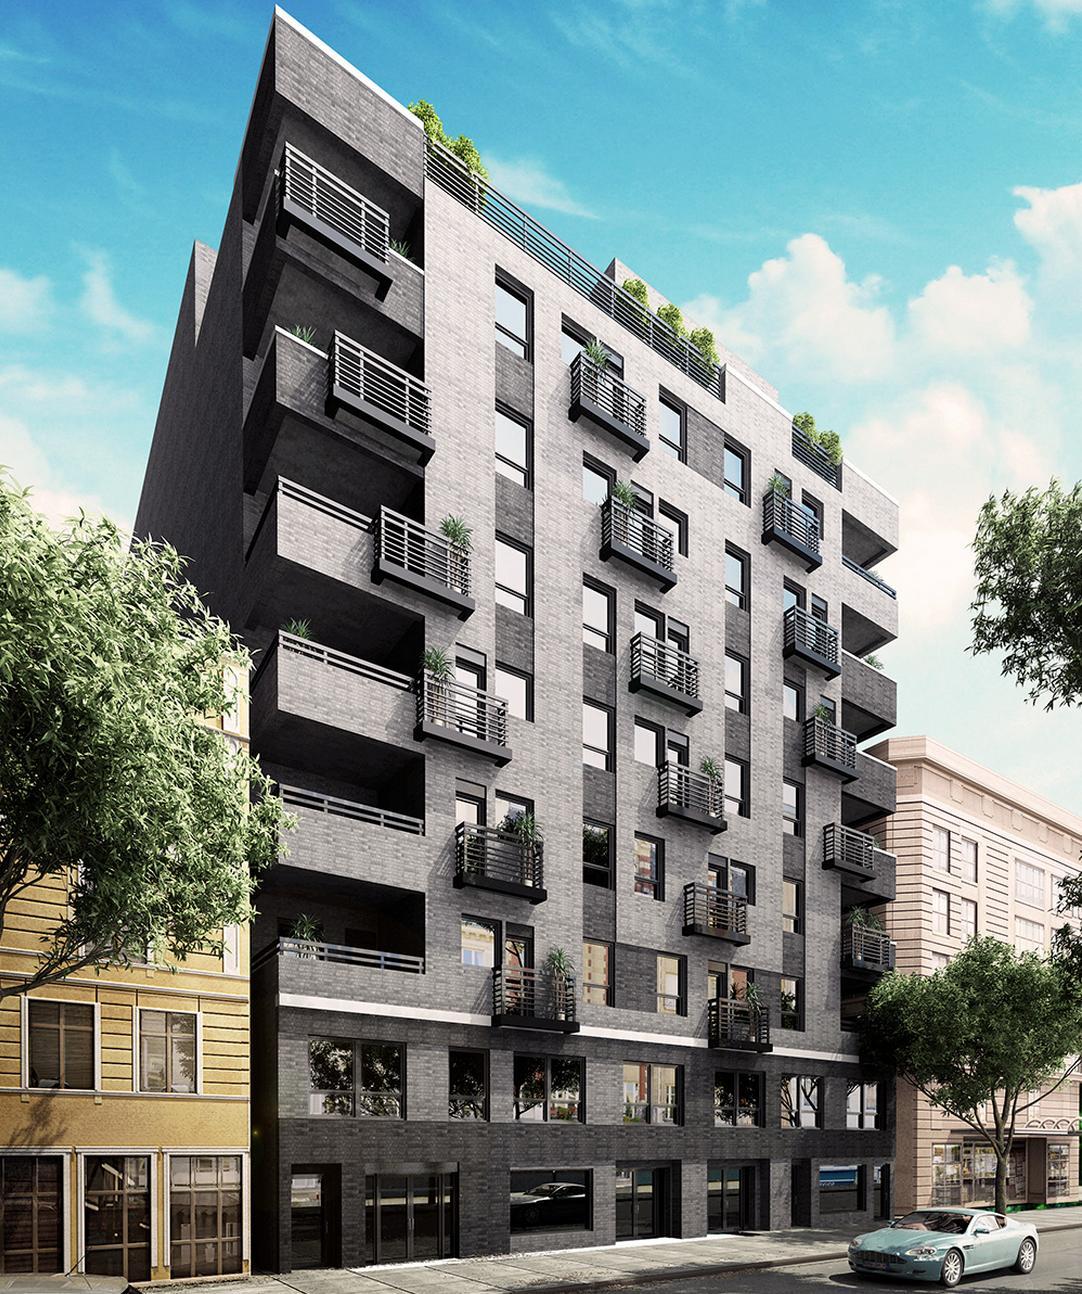 Nine-Story, 44-Unit Building Revealed At 802 Myrtle Avenue